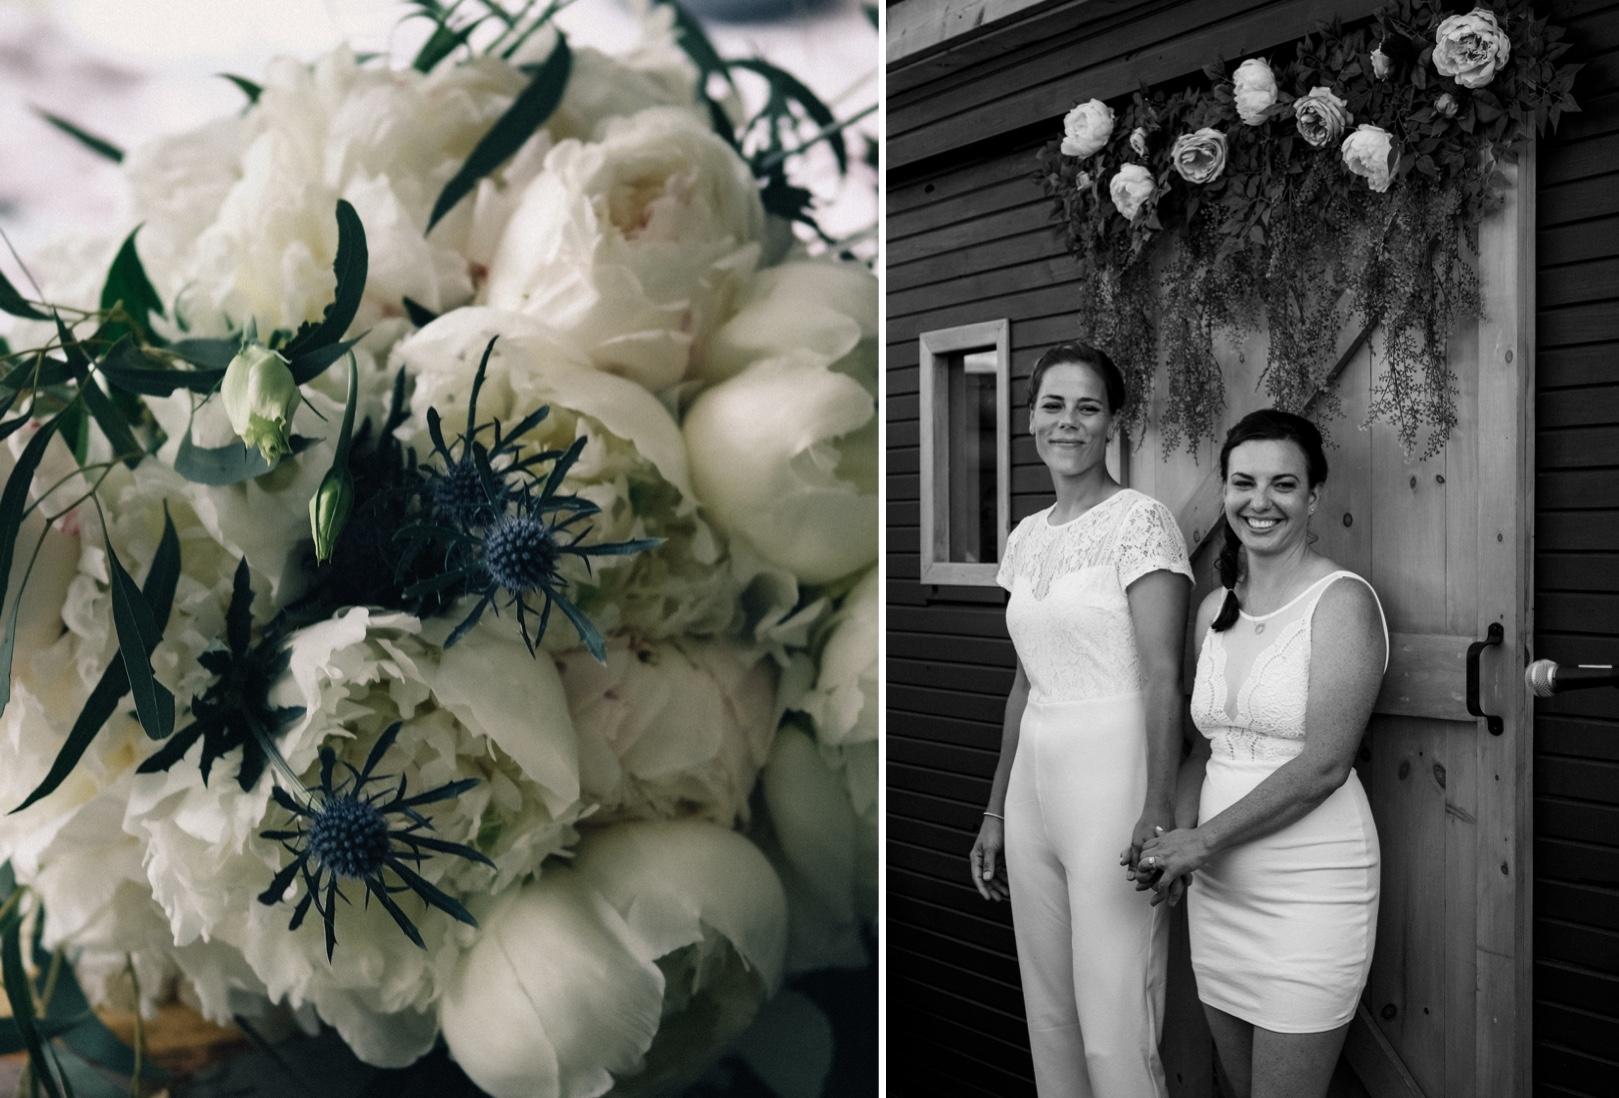 10_CARLEY STRATFORD-372_KAARA STACY-448_Events_Engagement_2018_Travel_Weddings_Photography_best_Portraits.jpg